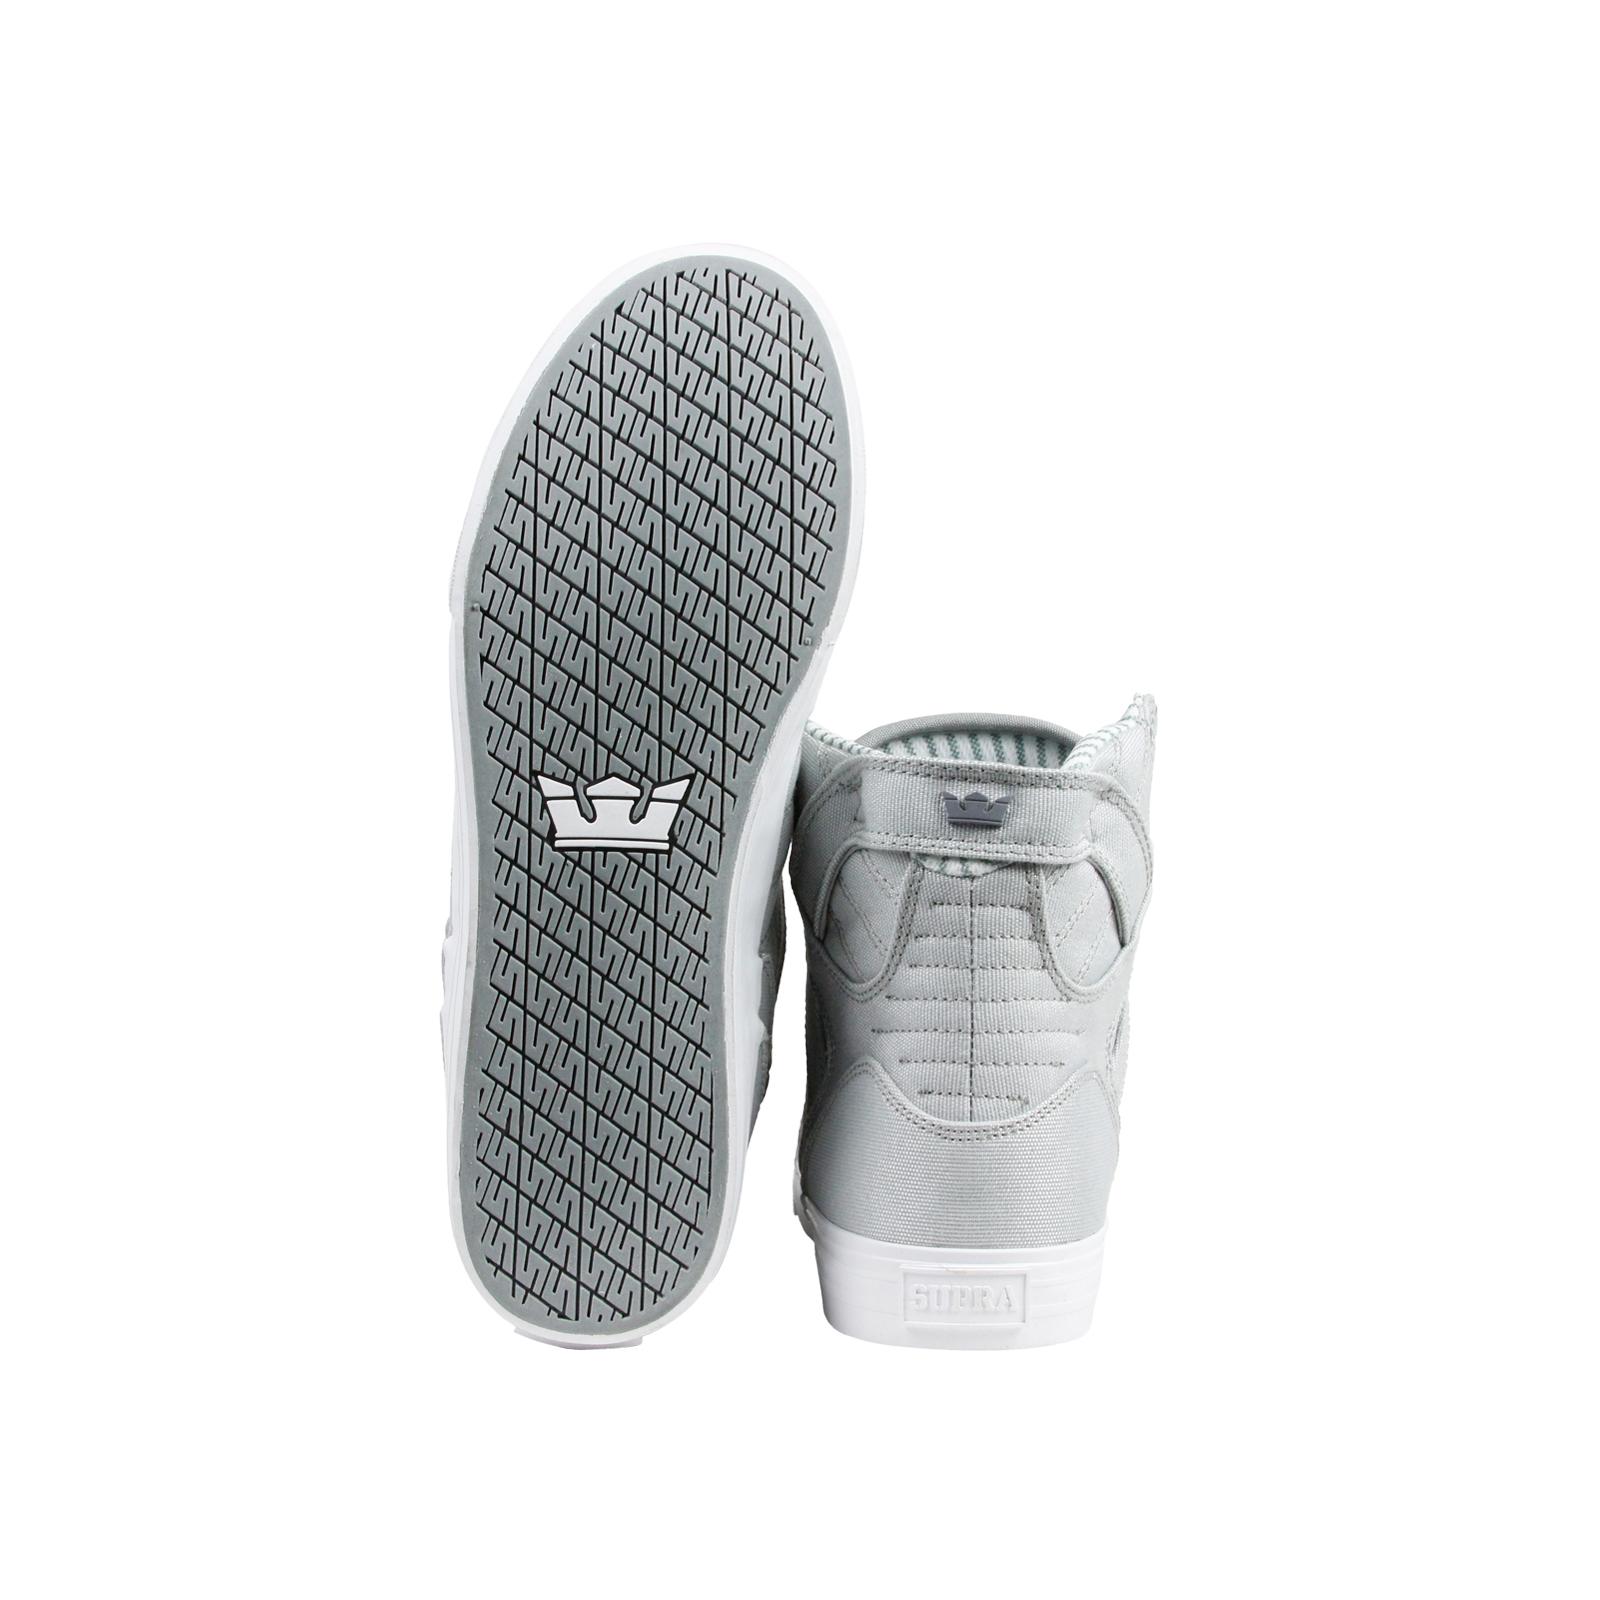 supra skytop spitzen mens graue leinwand hoch oben spitzen skytop bis sneakers, schuhe f74bea